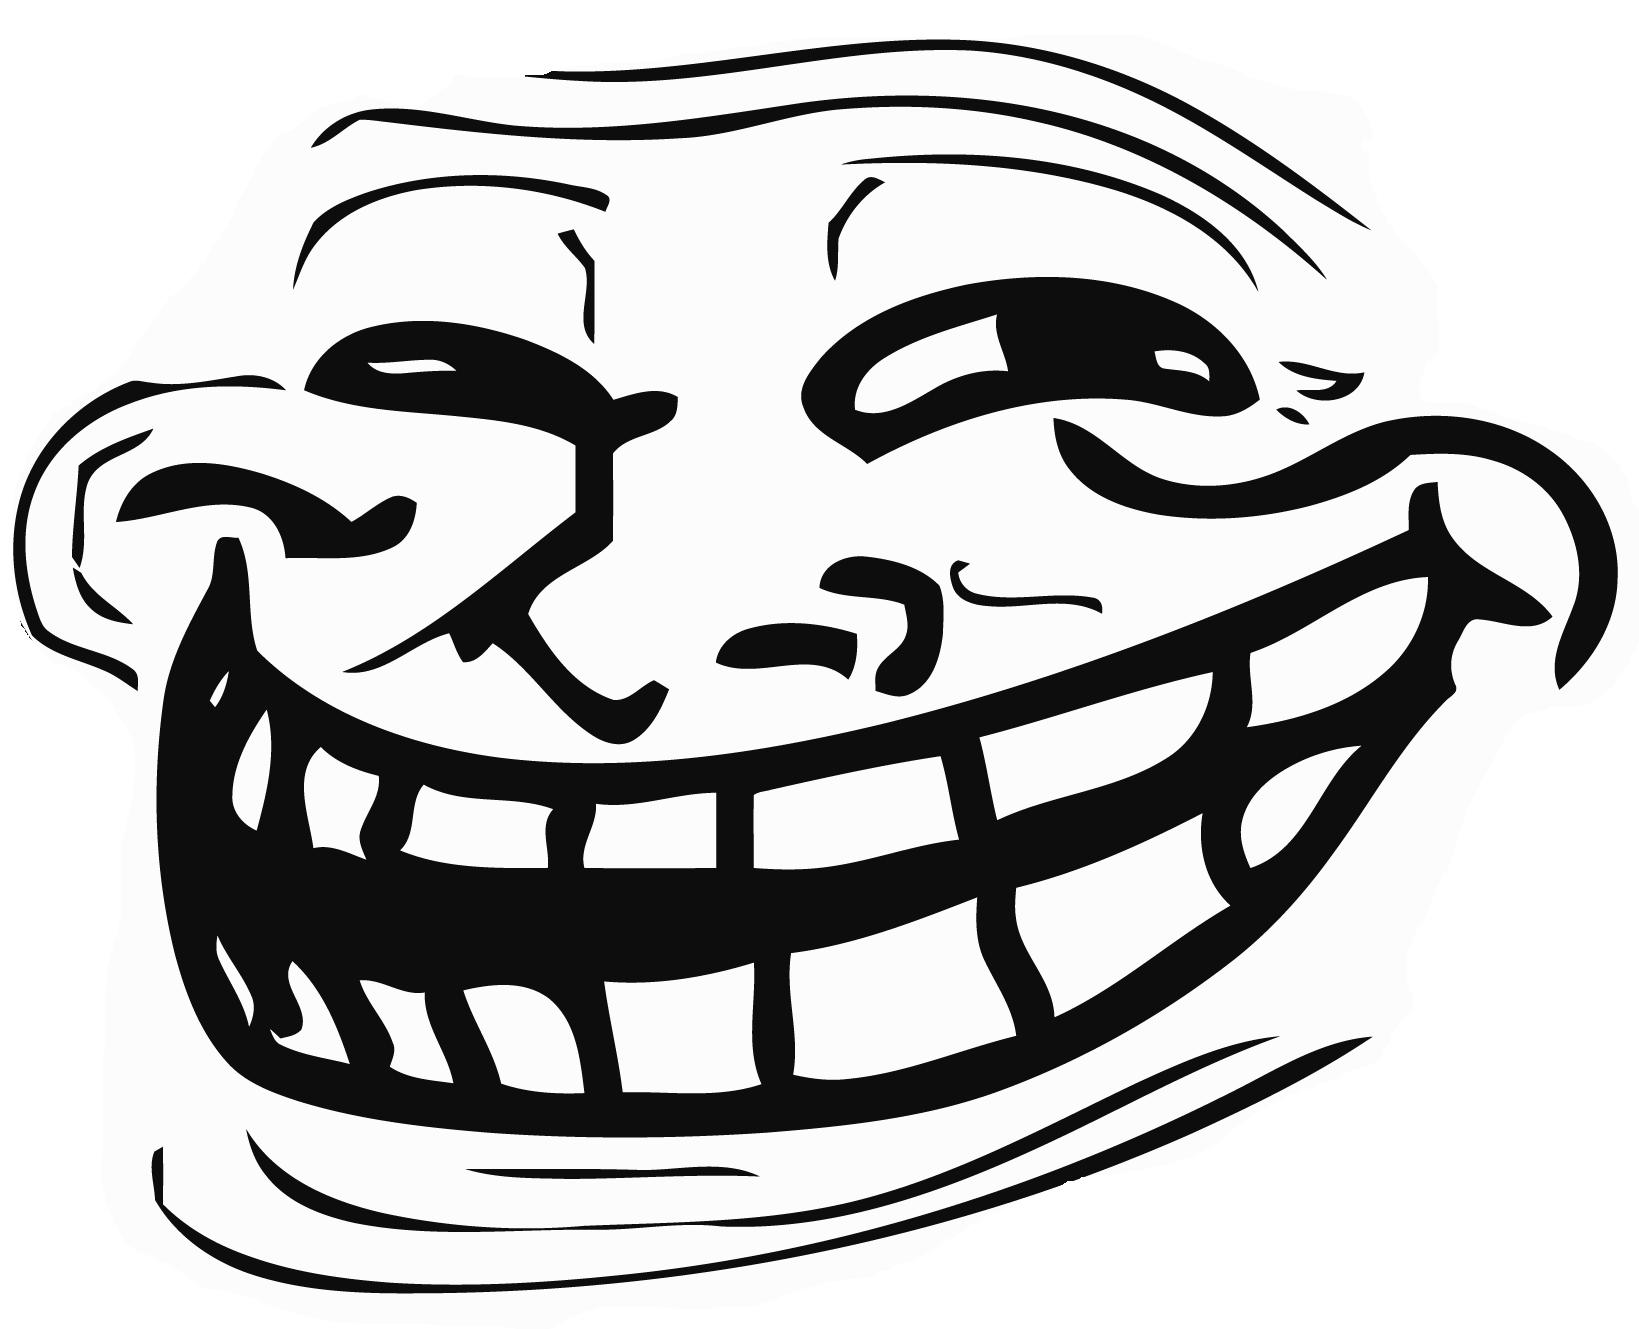 Image trollfaceg object shows community fandom powered by trollfaceg voltagebd Images